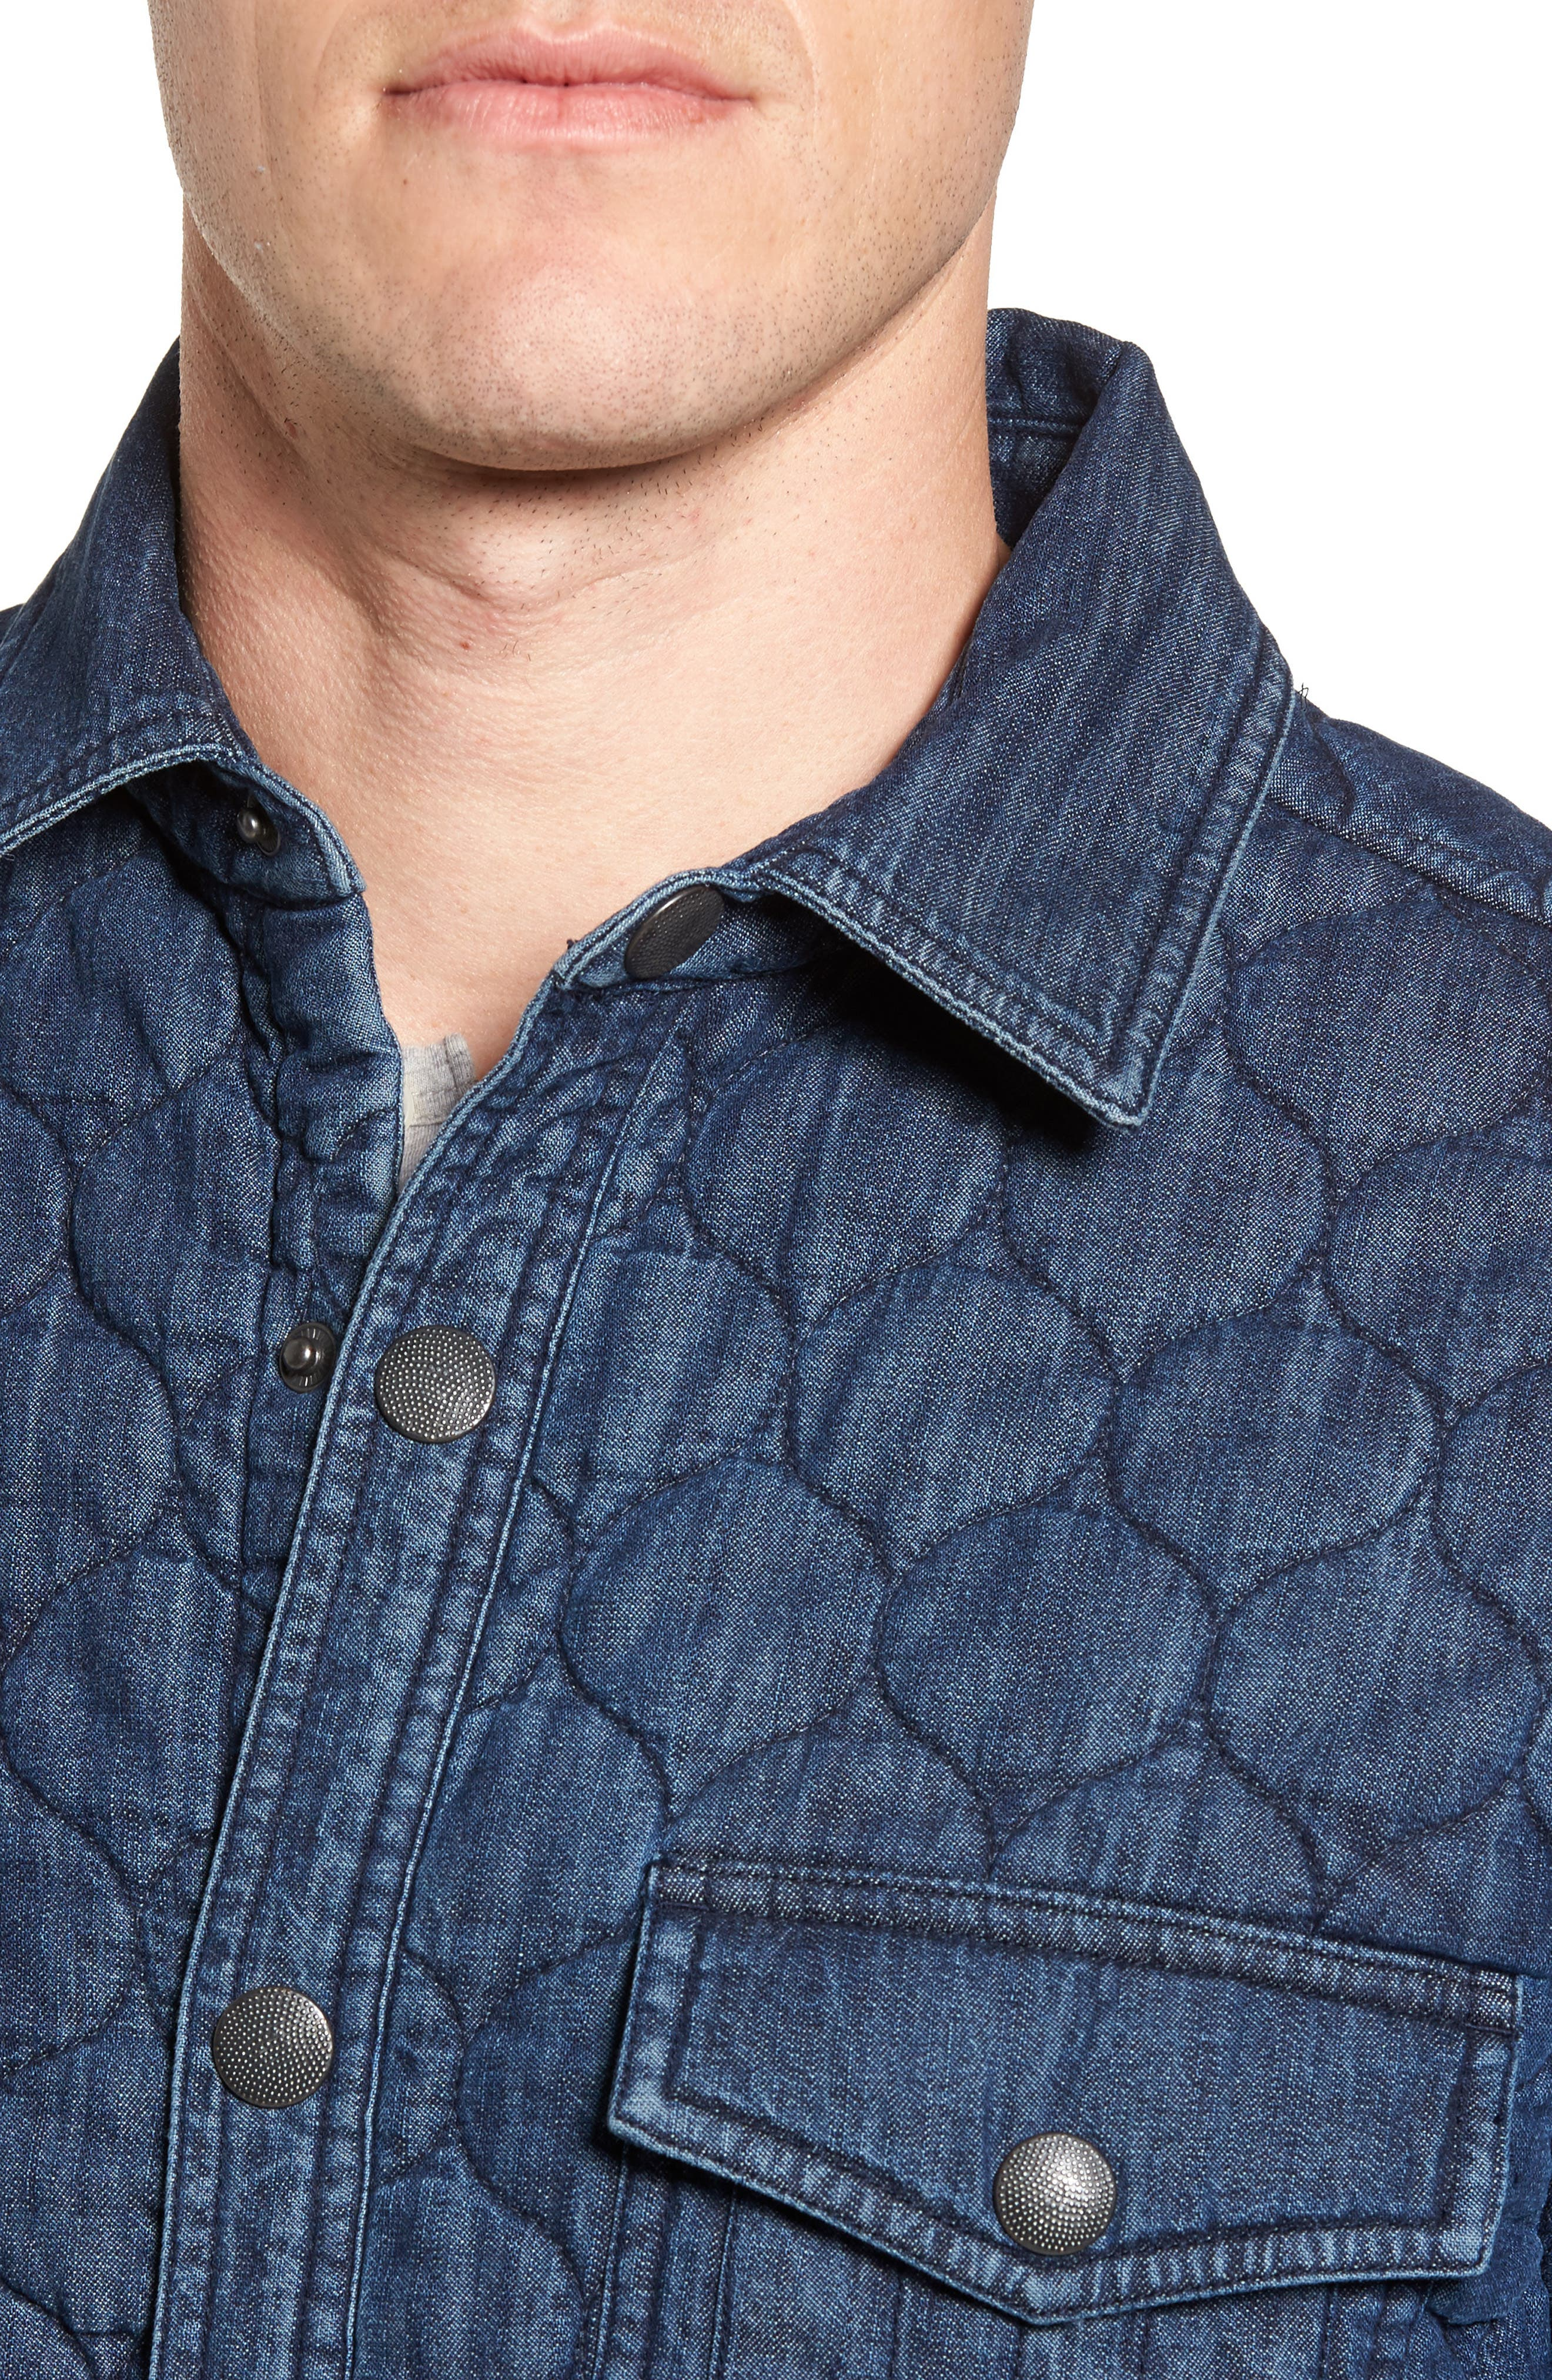 Quilted Denim Shirt Jacket,                             Alternate thumbnail 4, color,                             Navy Iris Indigo